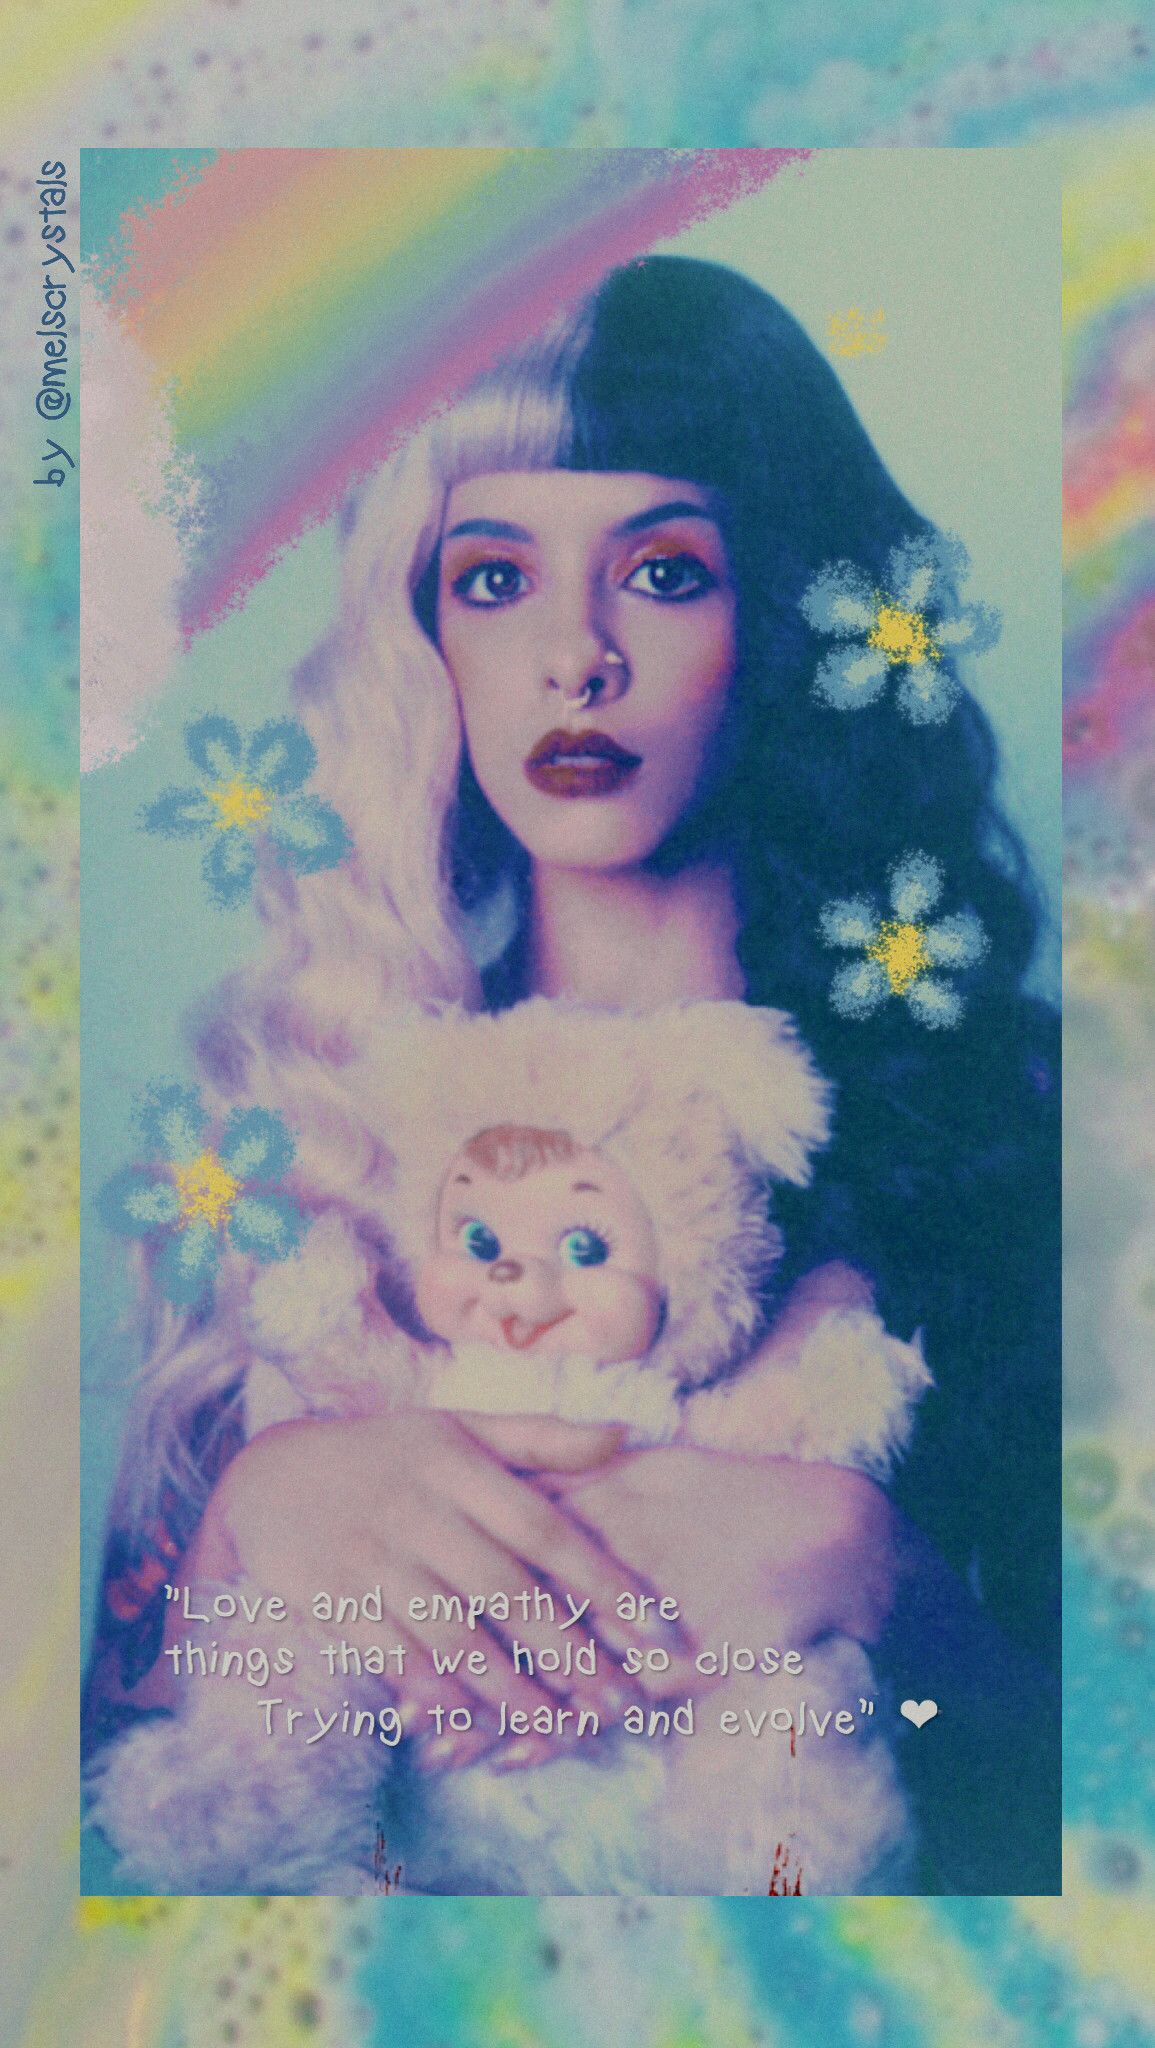 Melanie Martinez Wallpaper Credits To Melscrystals On Instagram Melanie Martinez Crybaby Melanie Martinez Melanie